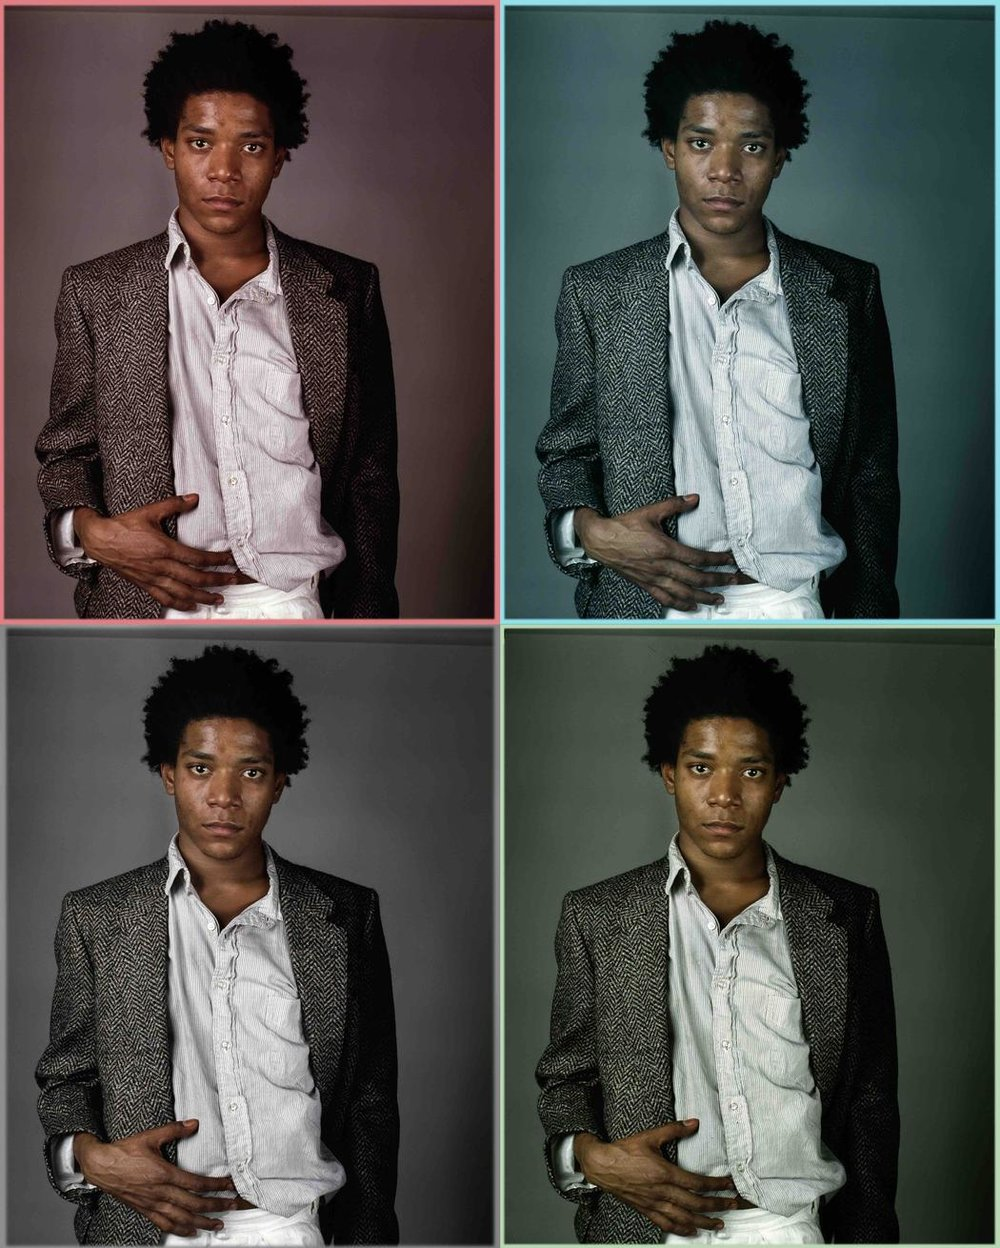 Richard-corman-basquiat-profile-photo-2.jpg